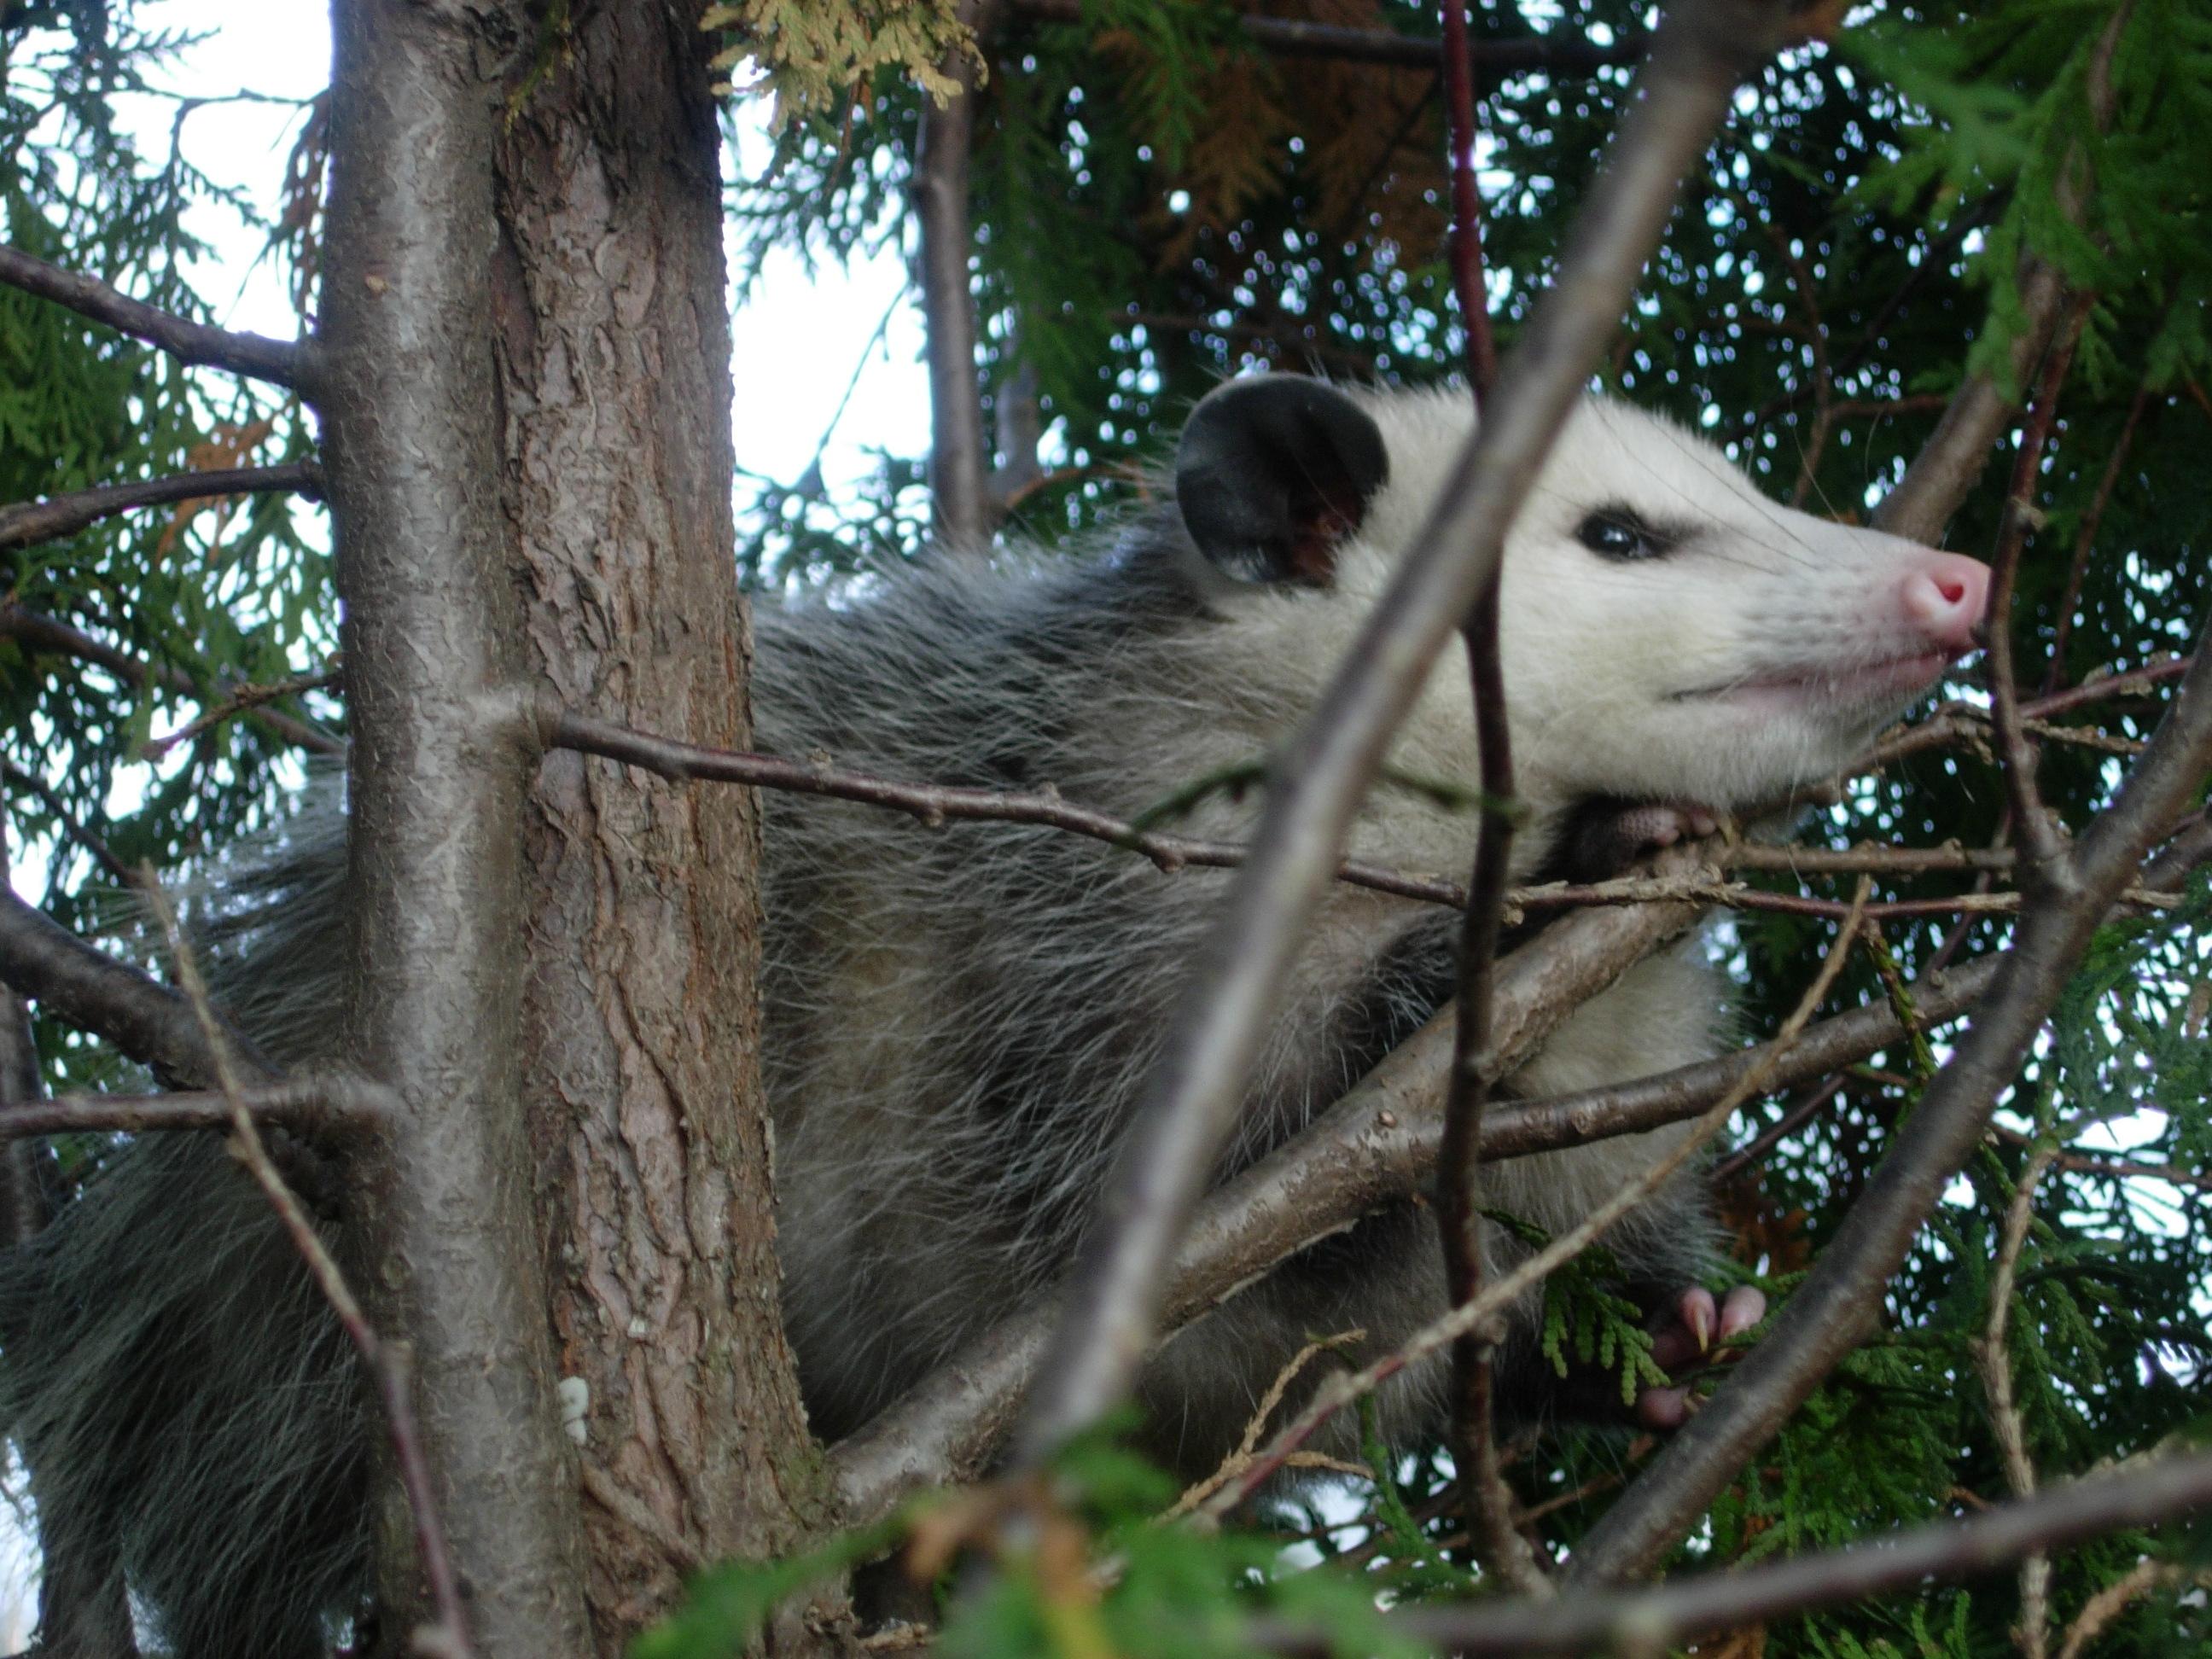 https://upload.wikimedia.org/wikipedia/commons/6/6a/Possum122708.JPG